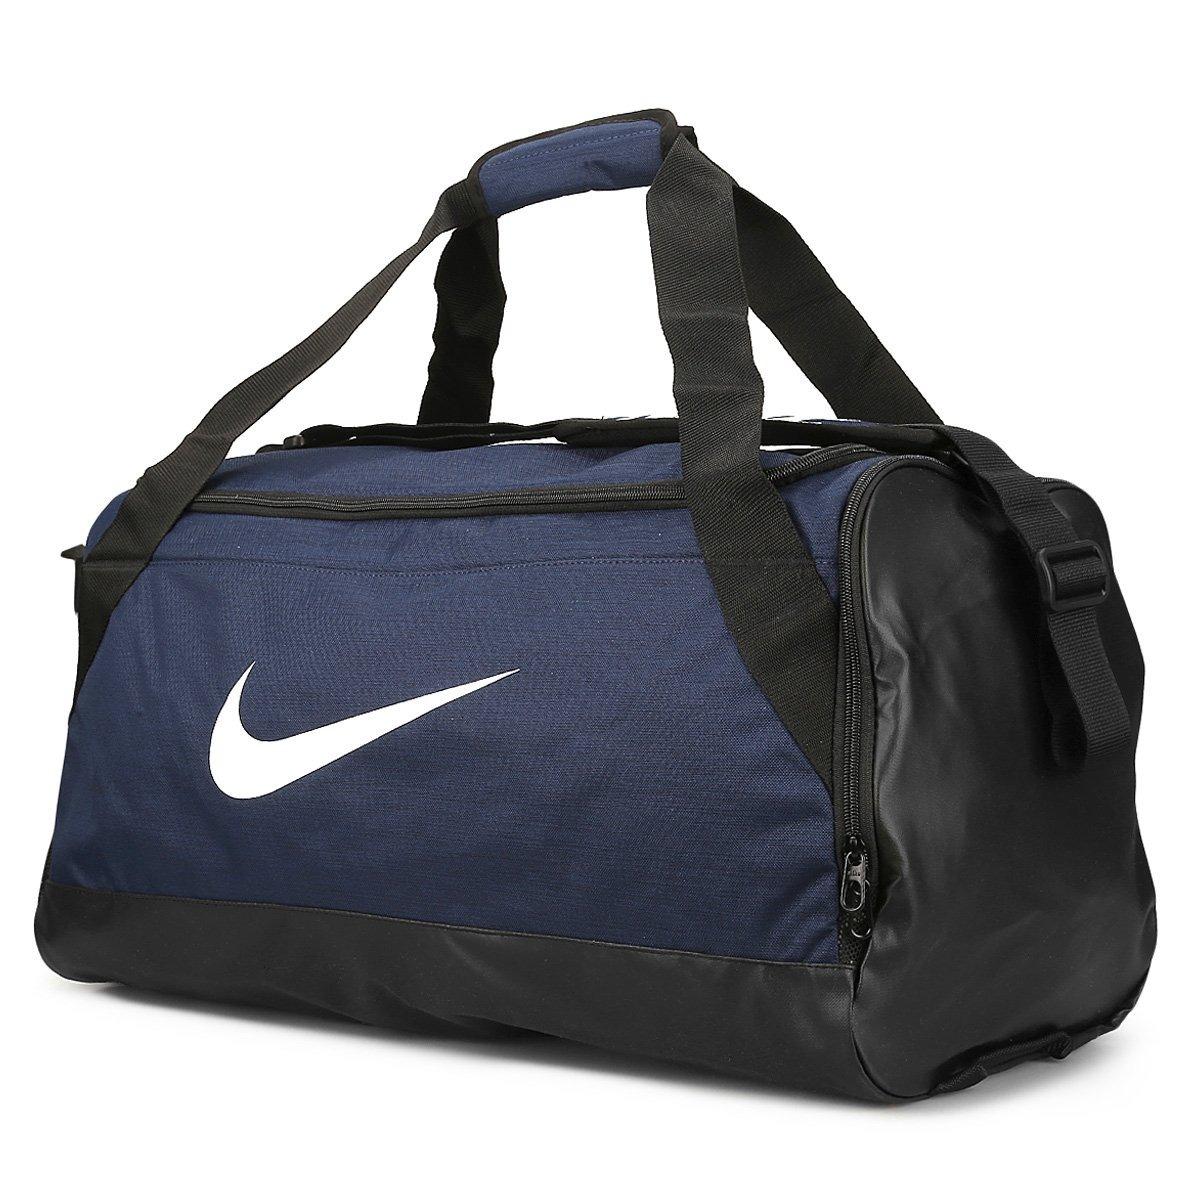 c16fb7adb Bolso Nike Brasilia Duffle !! Tamaño Mediano !! Unico !! - $ 2.599 ...